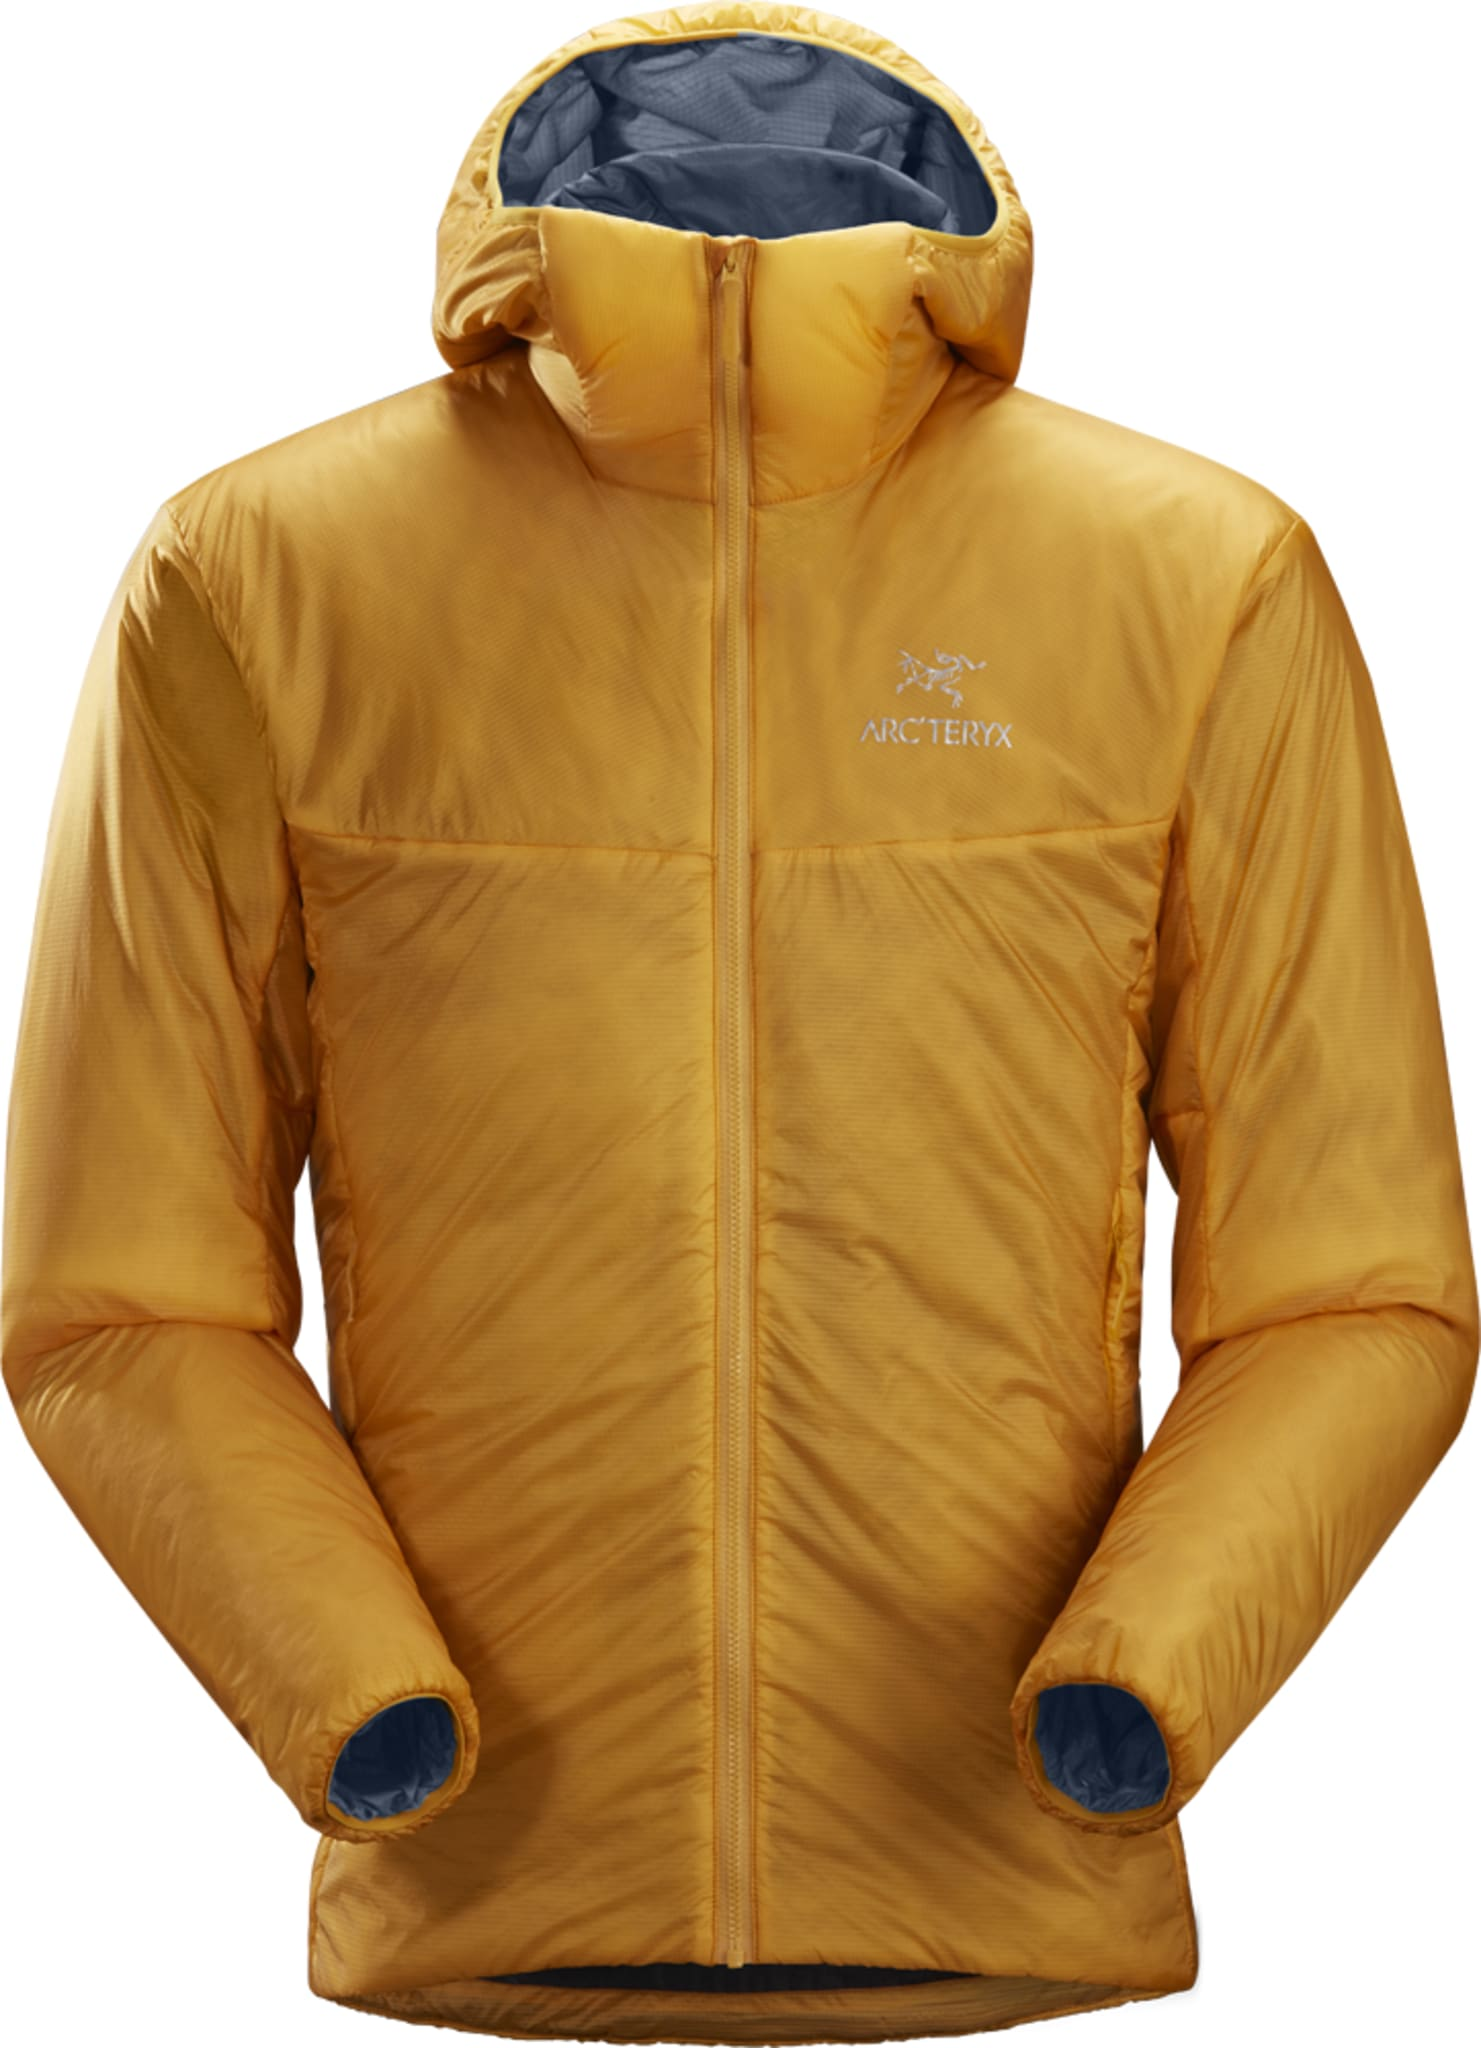 Nuclei FL Jacket Ms